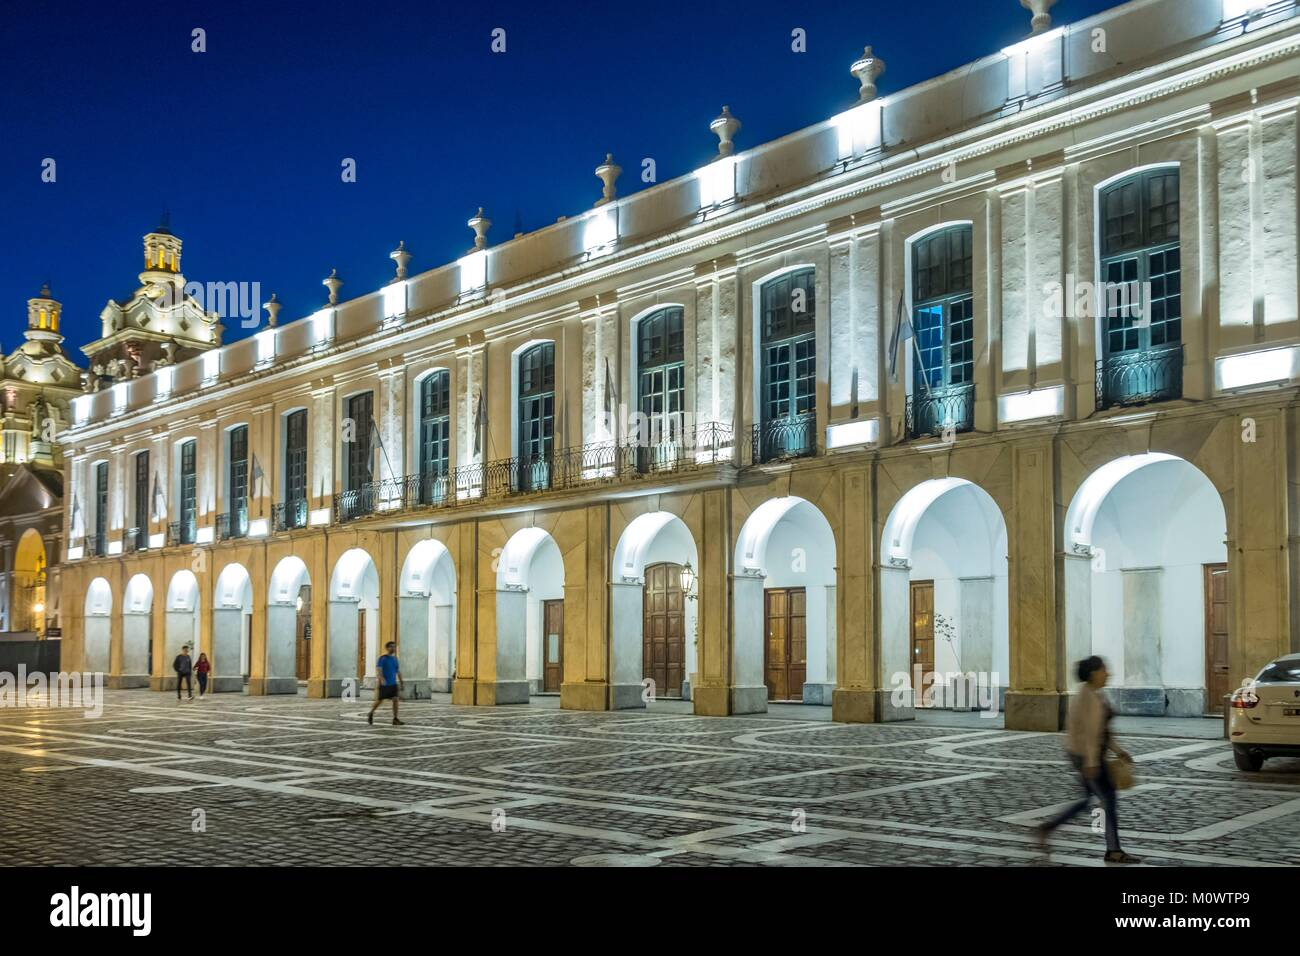 L'Argentine, Cordoba province,Cordoba,plaza San Martin,Cabildo Photo Stock